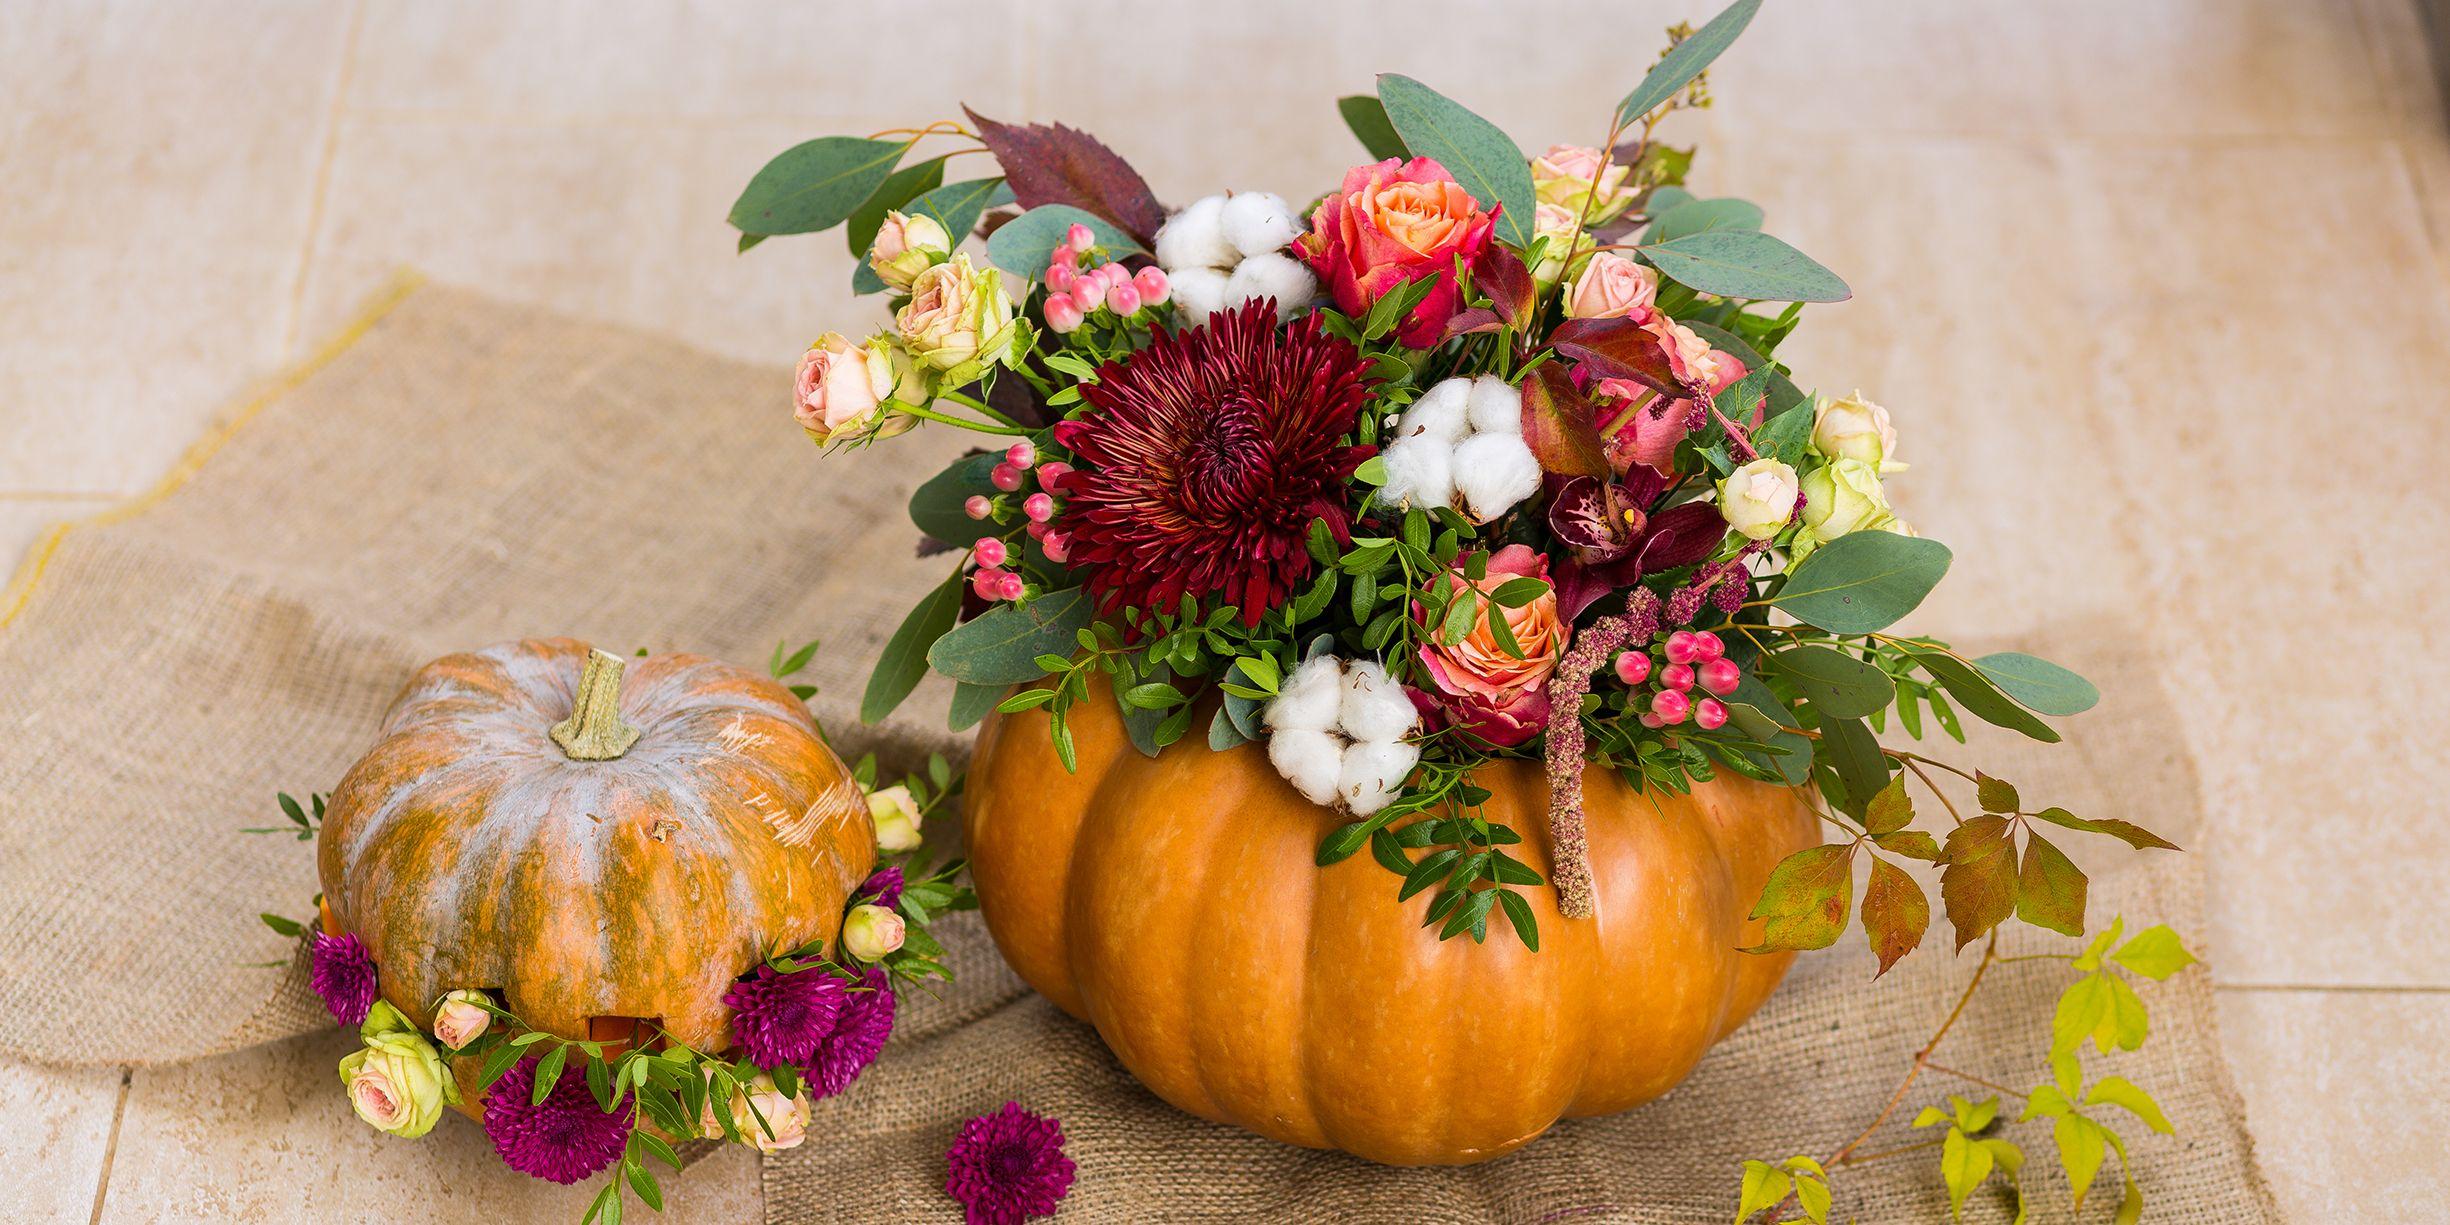 Good Thanksgiving Decorations